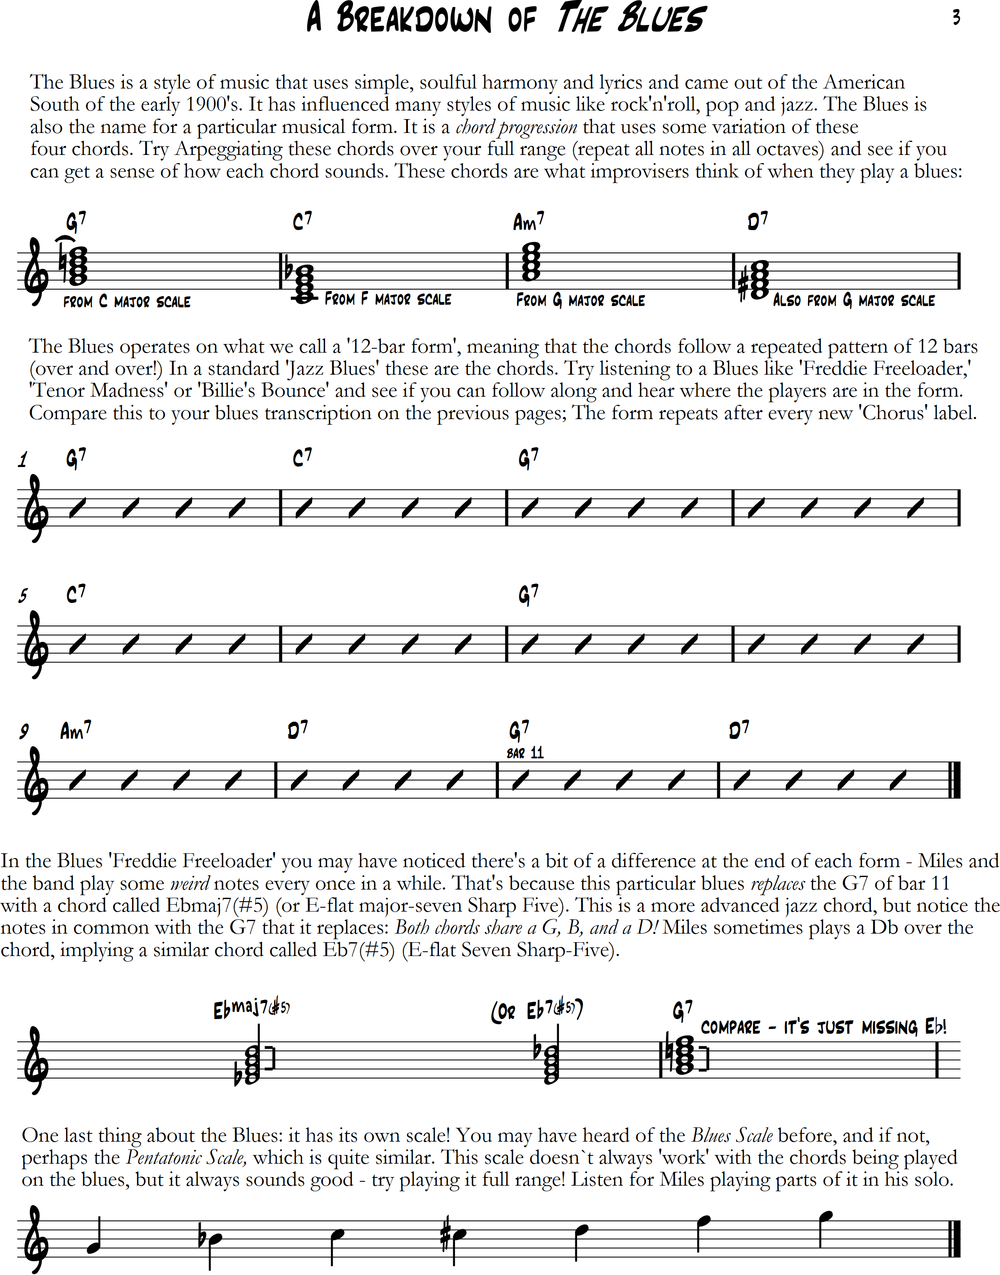 Freddie Freeloader - Miles Davis' Solo_0003.png